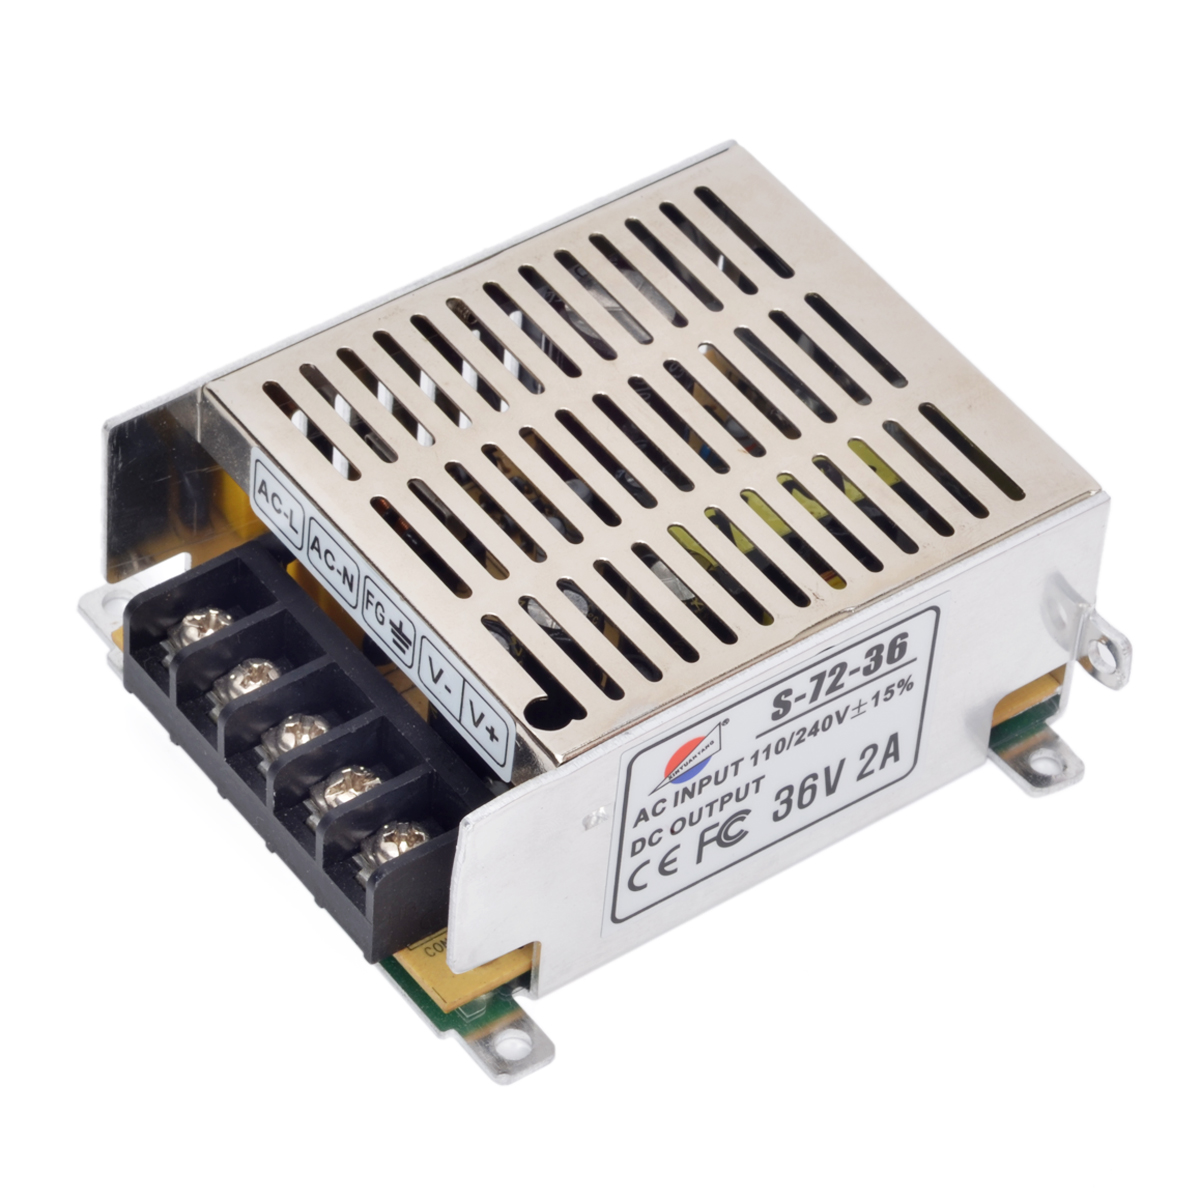 36V 2A Power Supply Adapter for LED Light Power Supply Driver Adapter Voltage Transformer for Led Strip Light Display 110V/220V(China (Mainland))